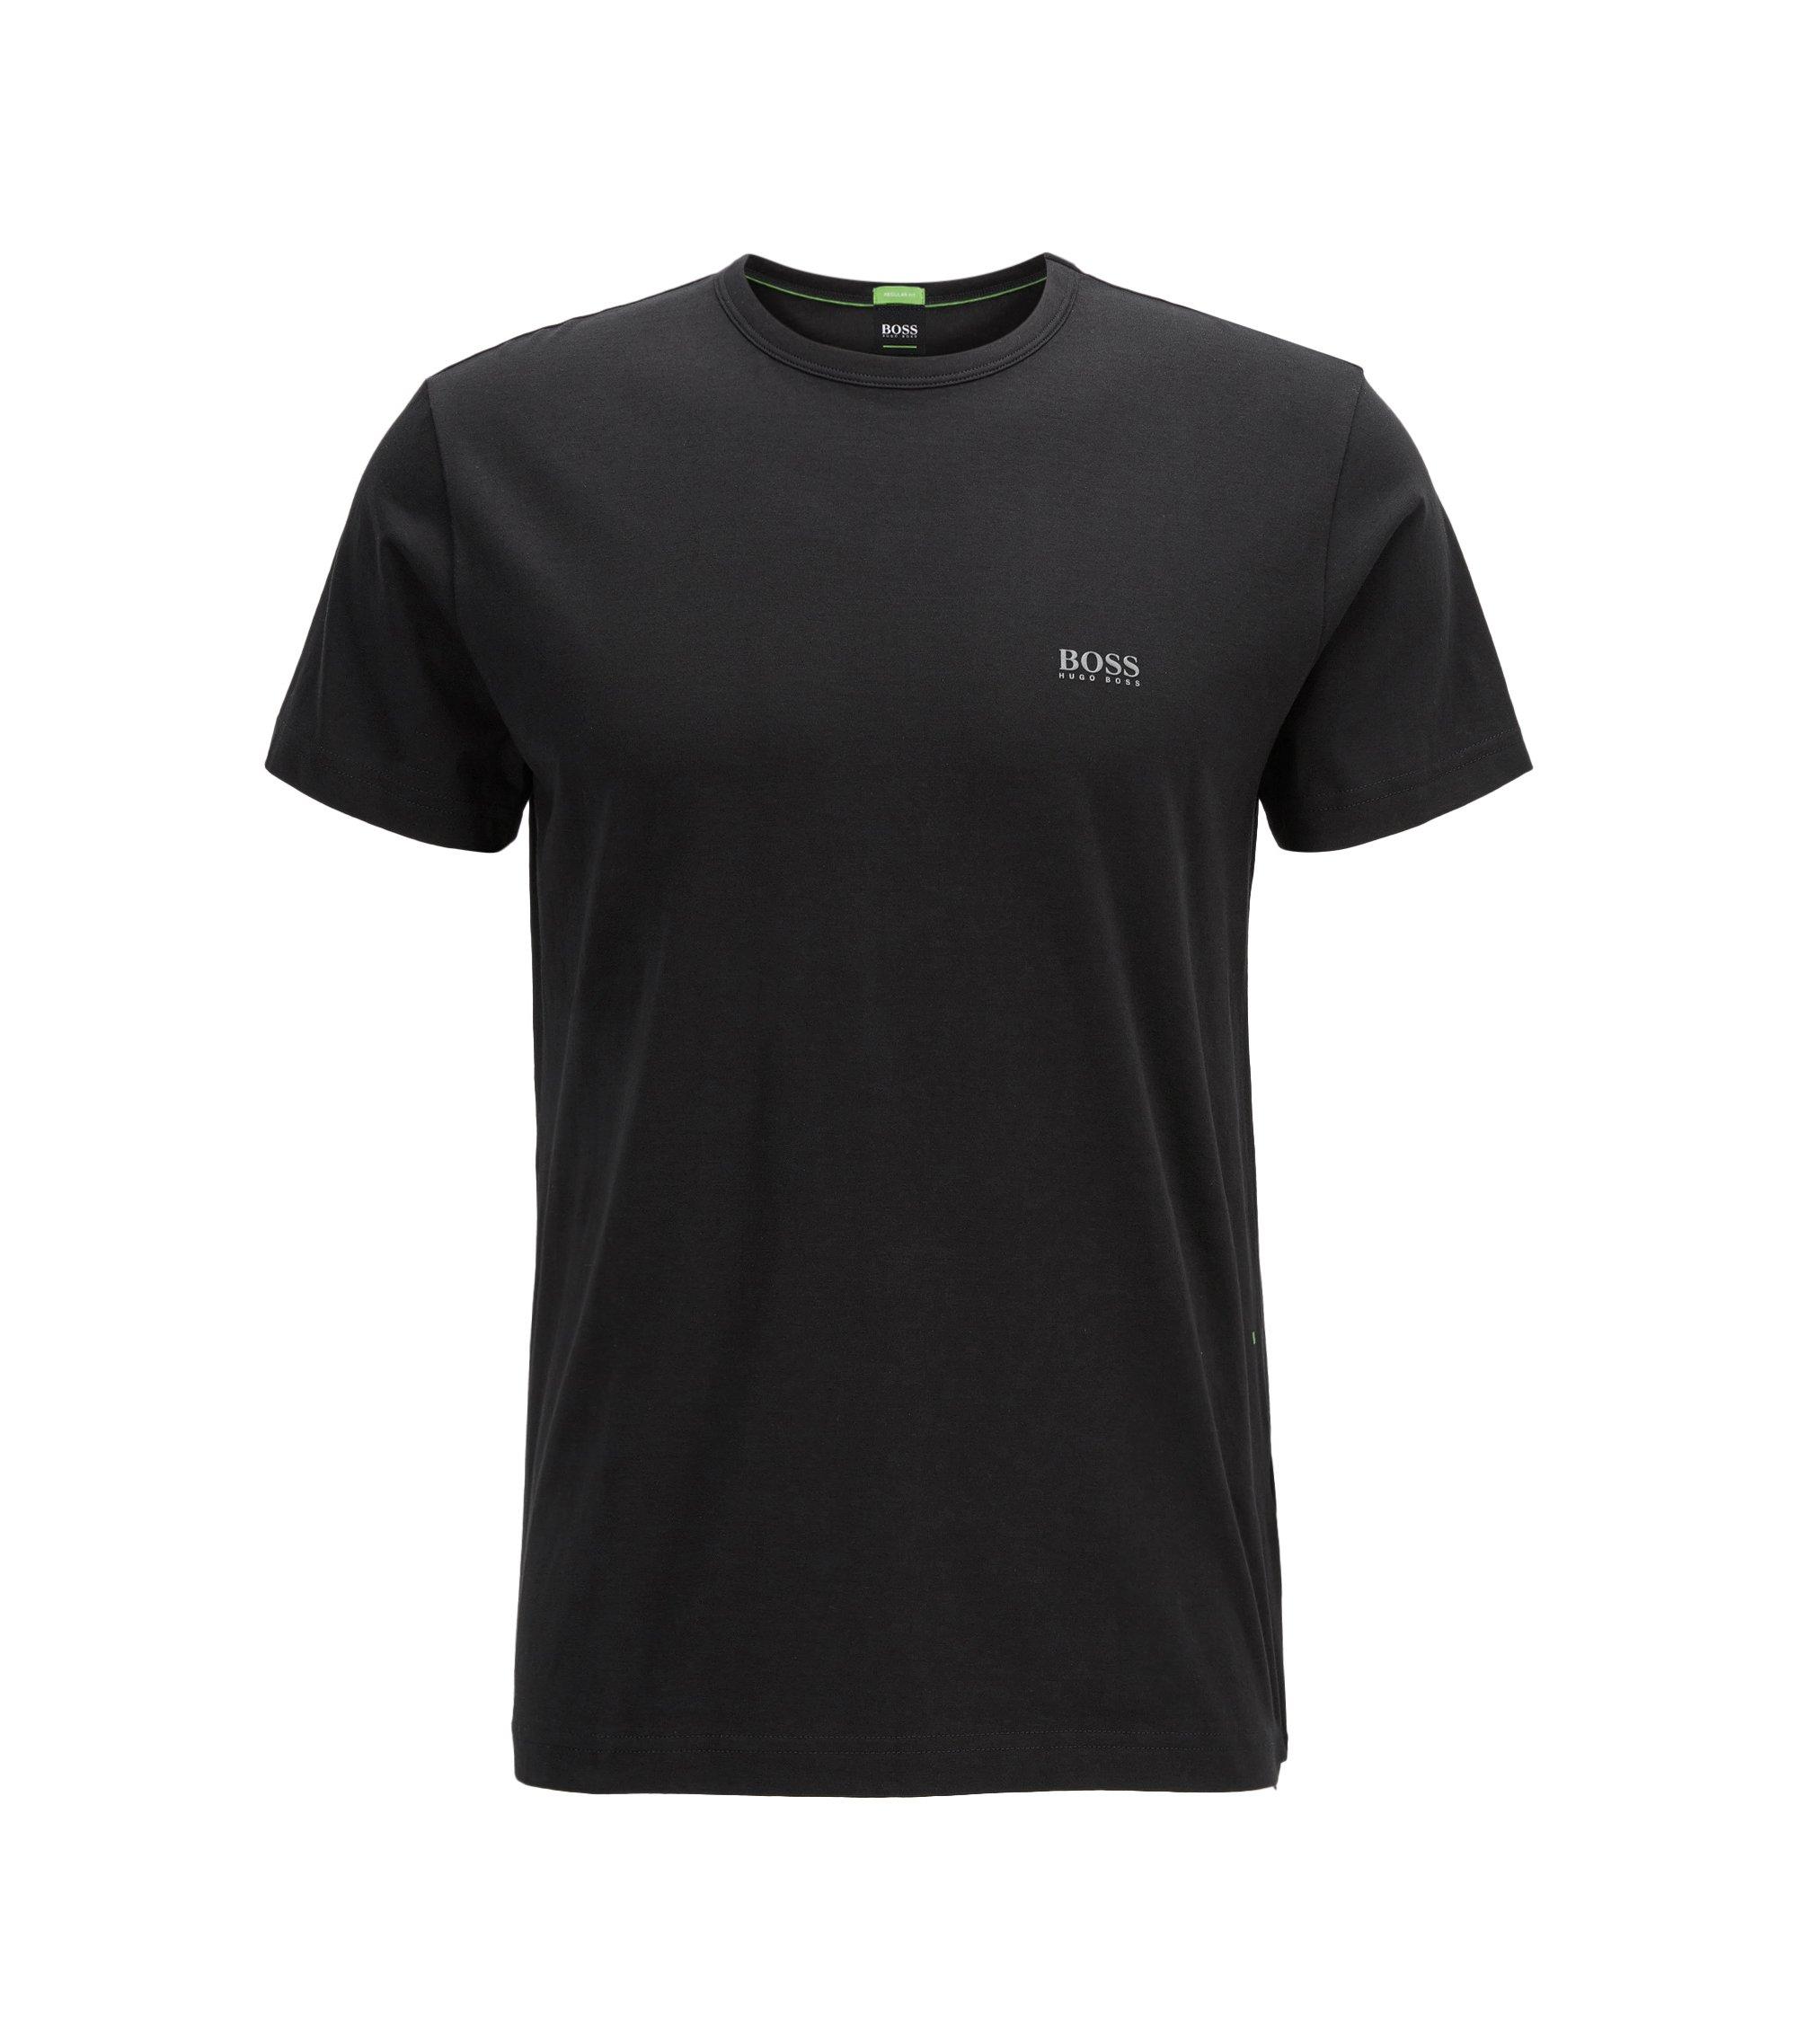 'Tee' | Cotton Jersey Logo T-Shirt, Black